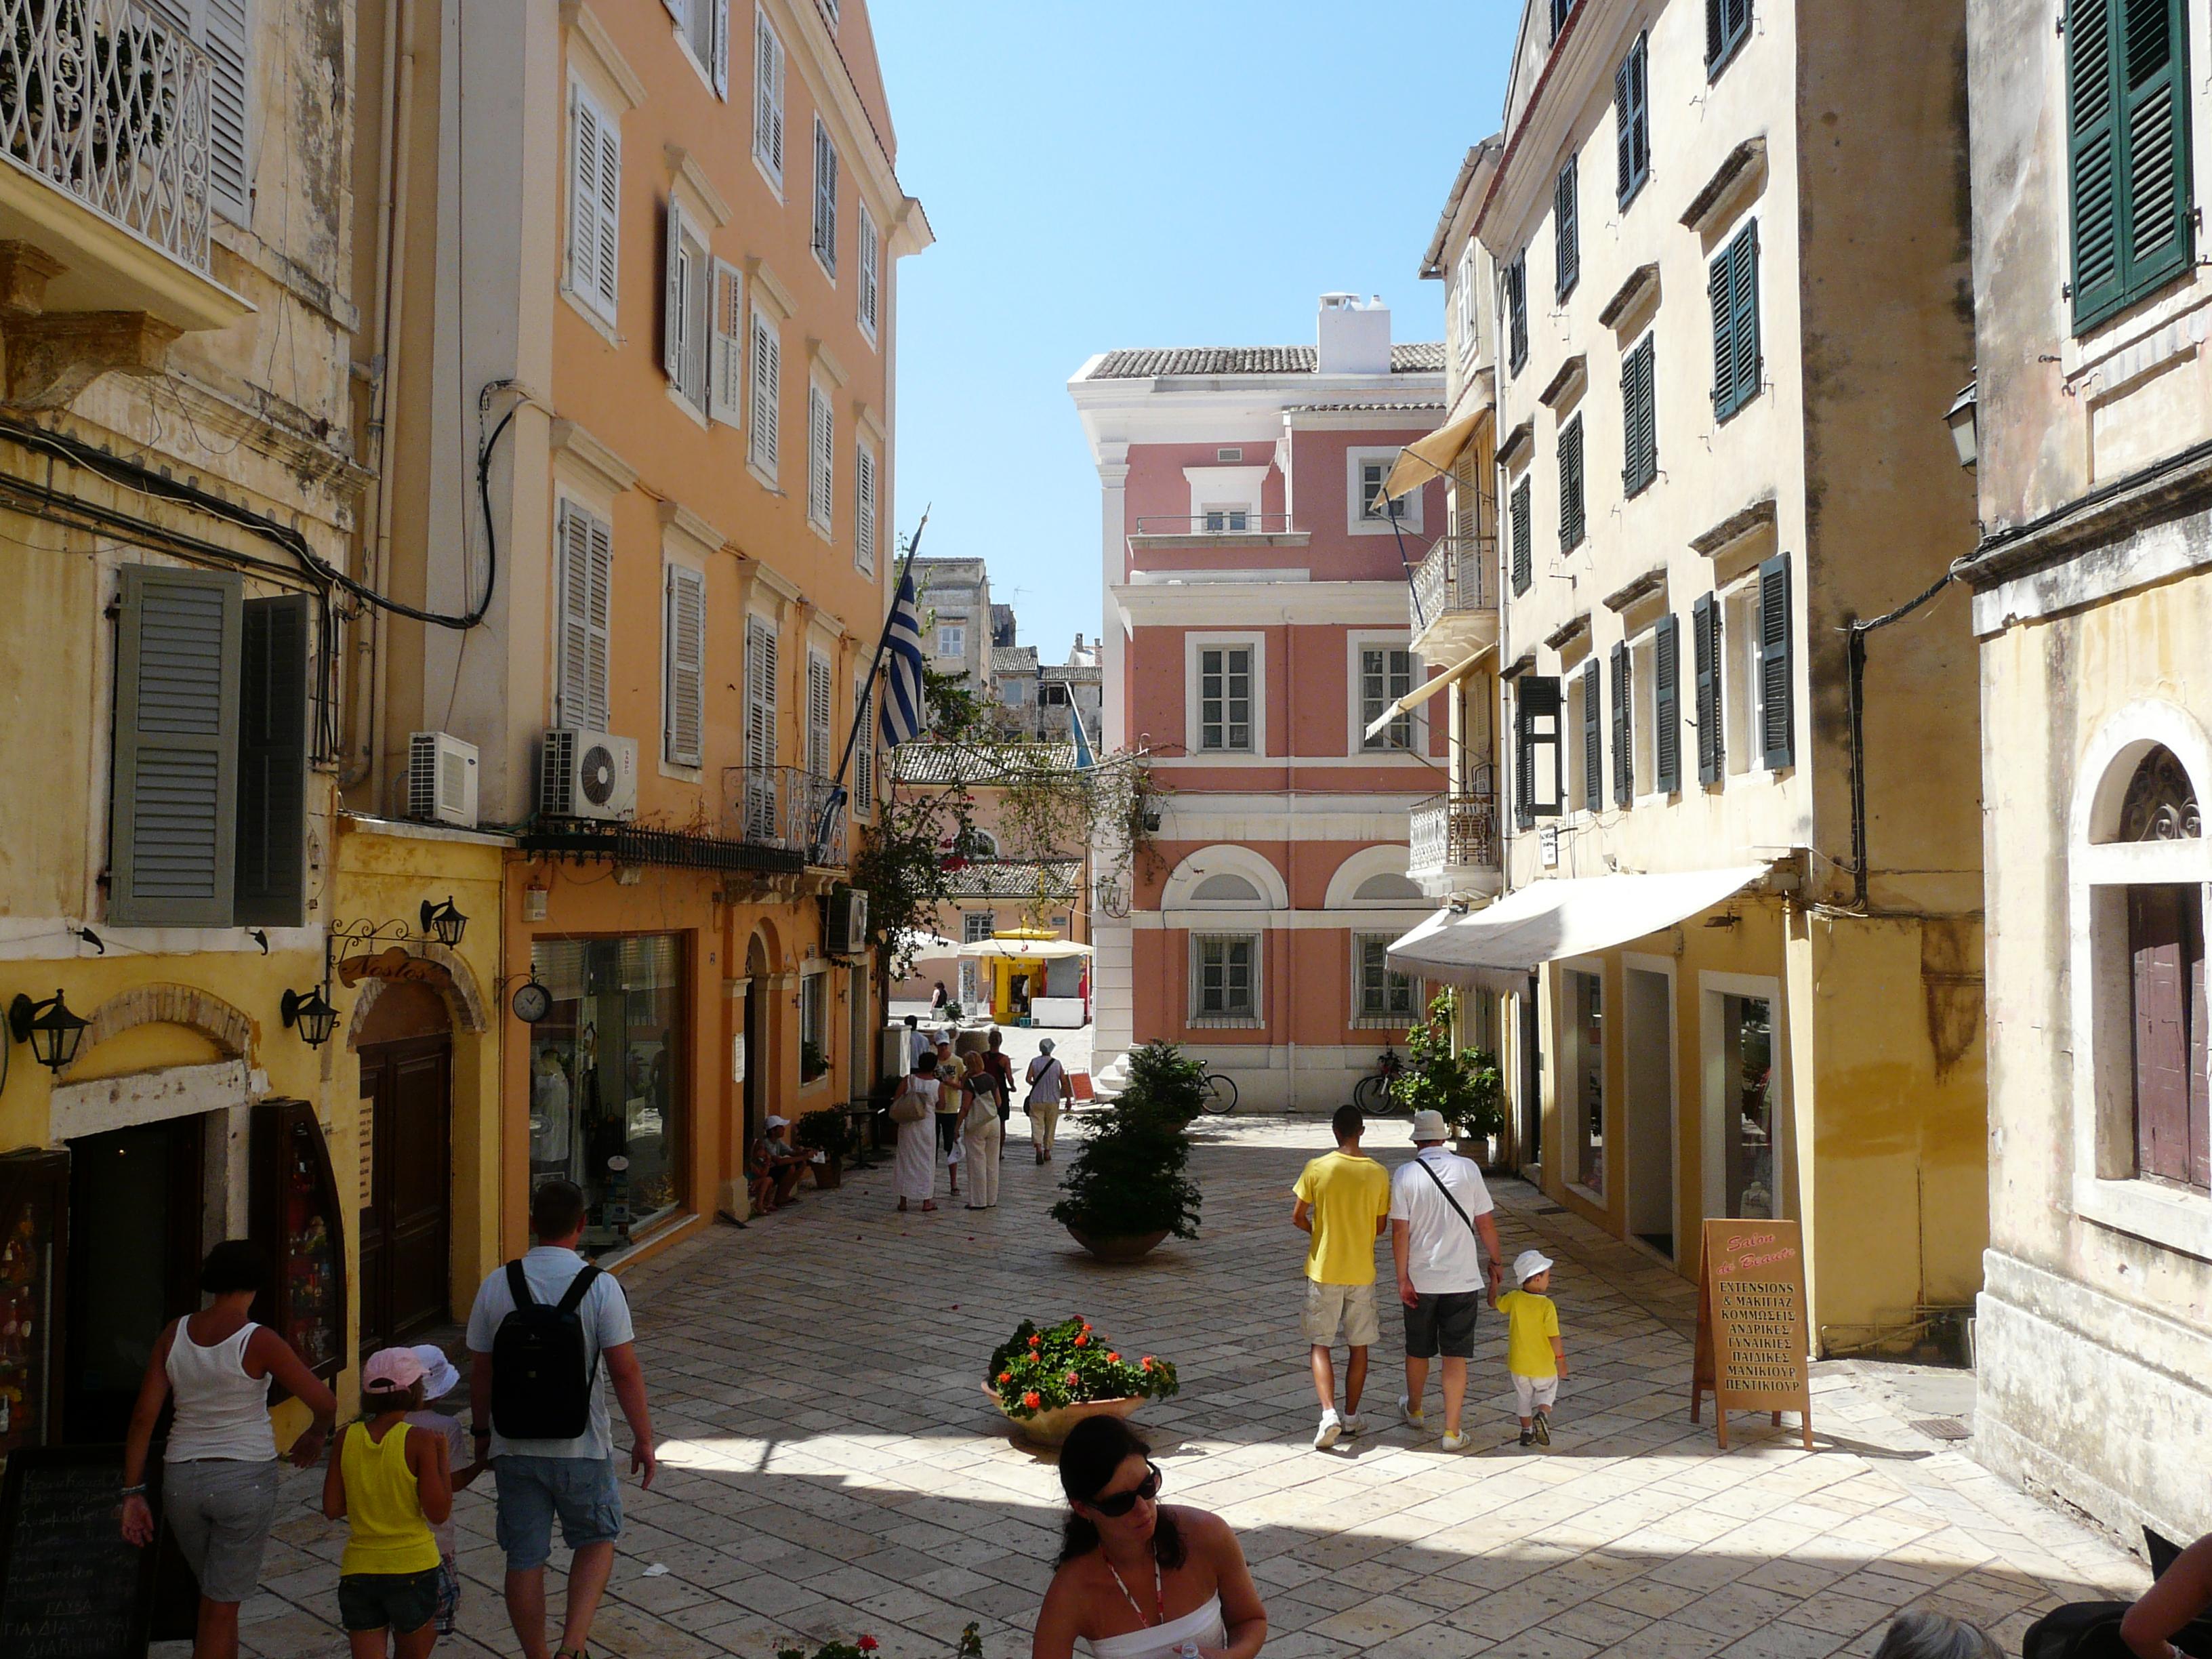 File:Corfu town 14.JPG - Wikimedia Commons